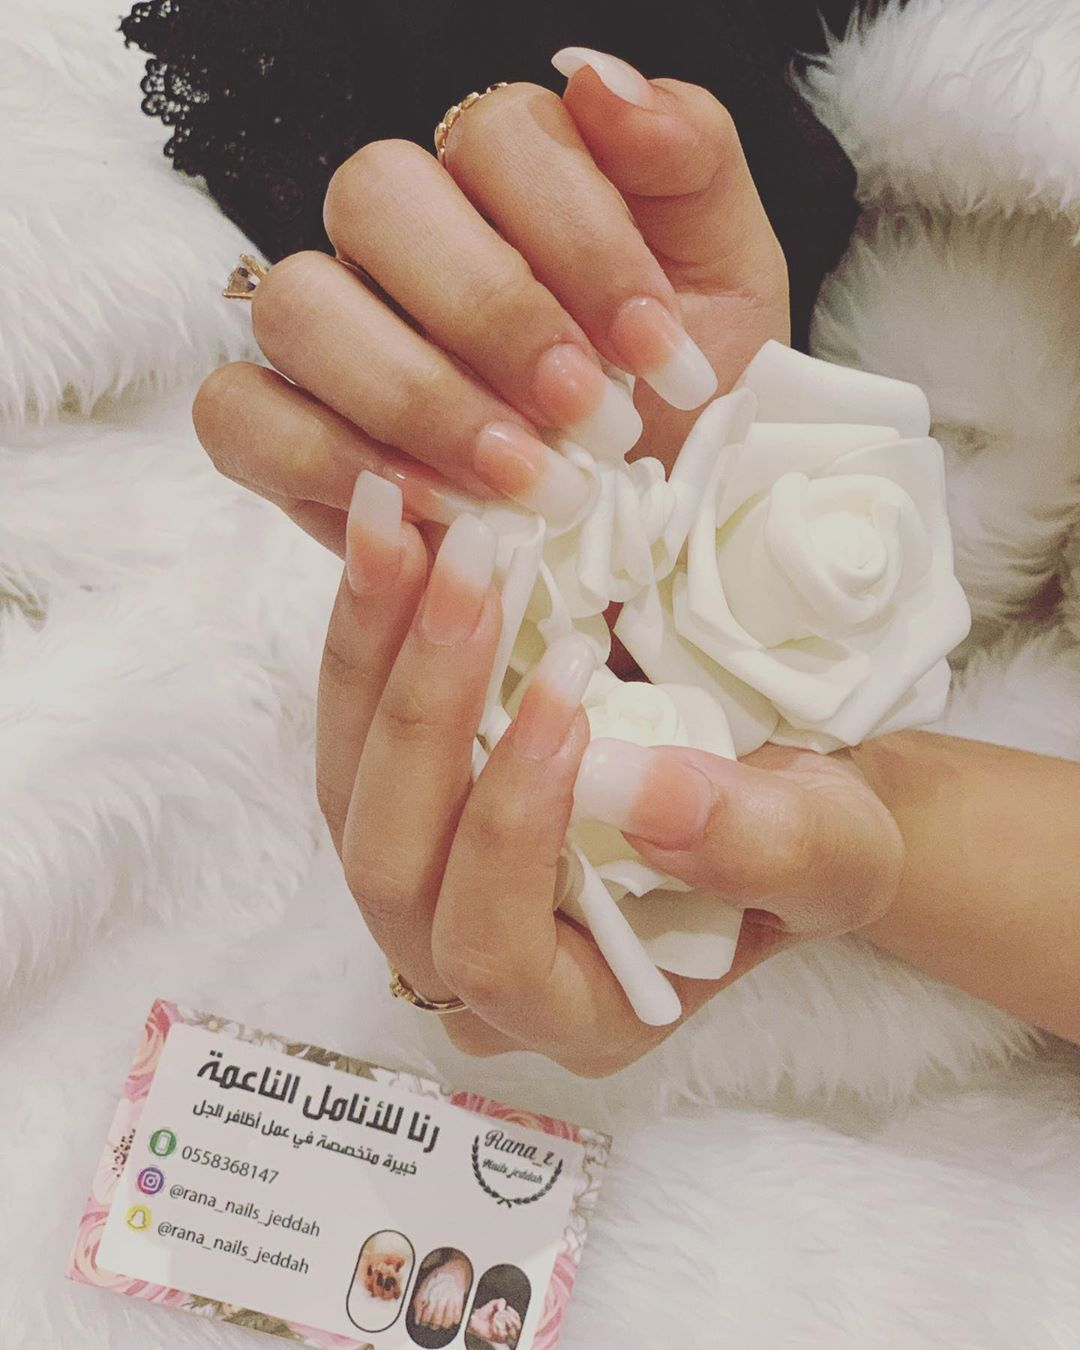 Nalis Nails Gel Acrylicnails Acrylic Jeedah Alhamdania Hamdaniah Jeddah Acrygel Acrygelnails Gelnails Na Instagram Posts Engagement Instagram